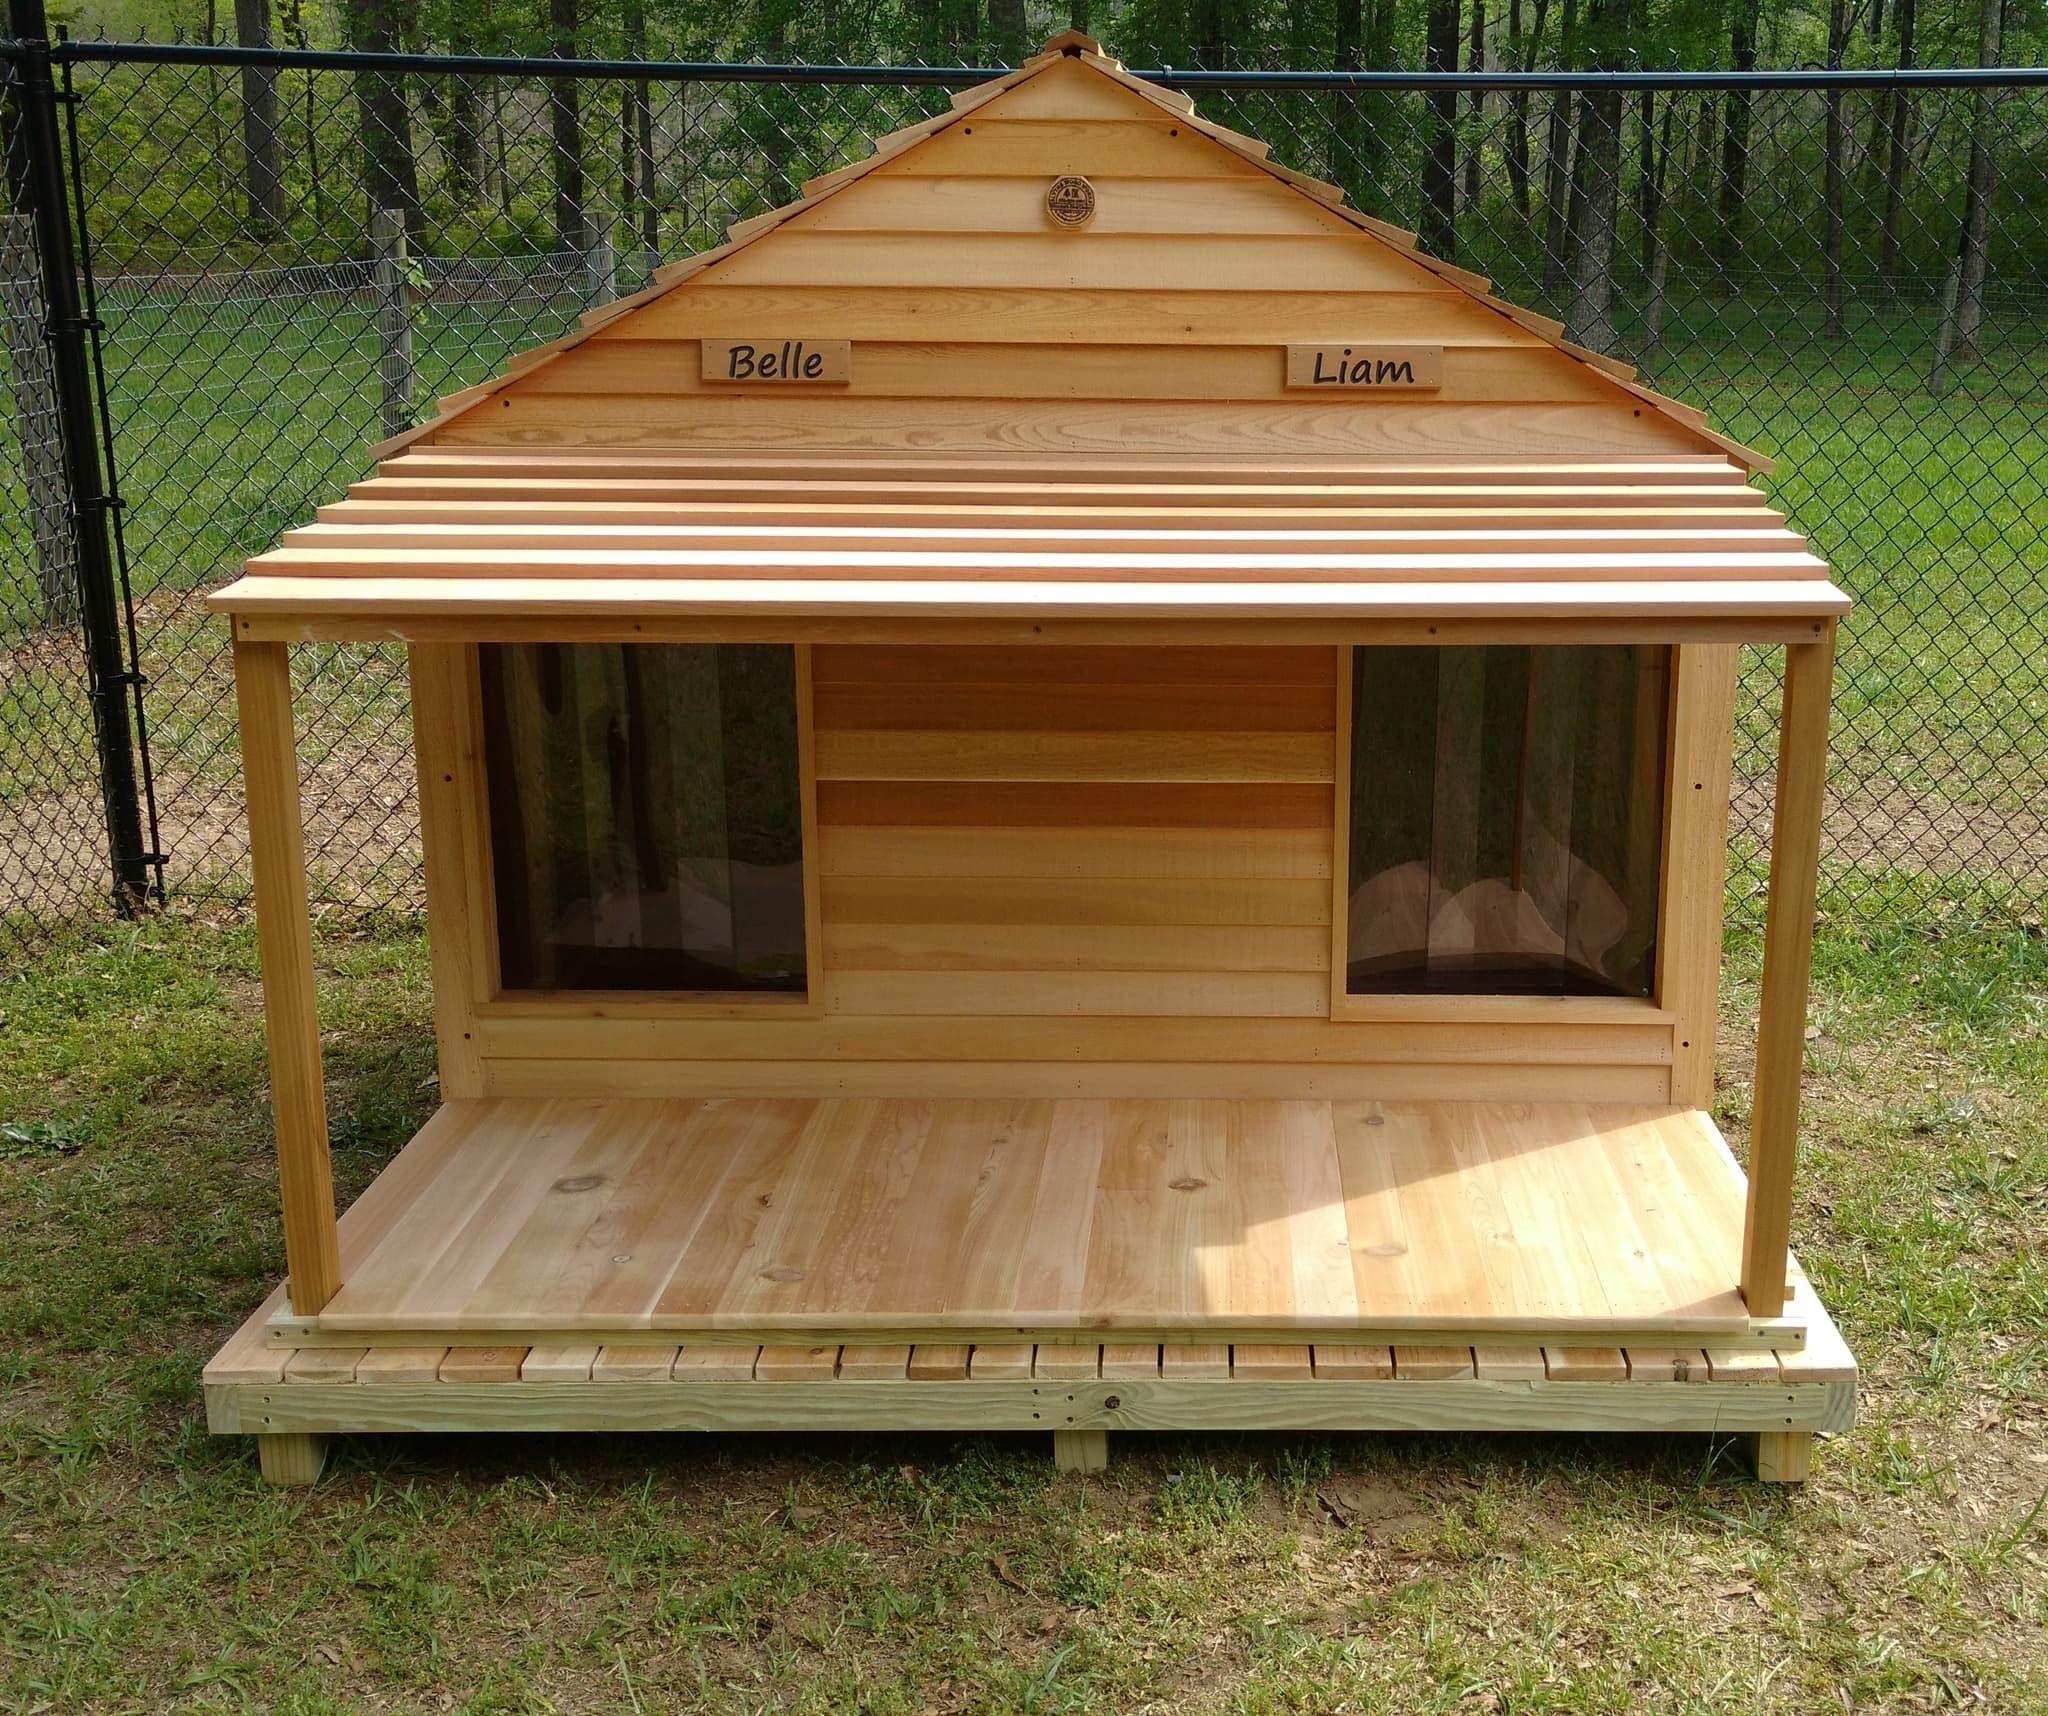 Goliath Duplex Dog House Custom Cedar Dog House for 200 lb Dogs